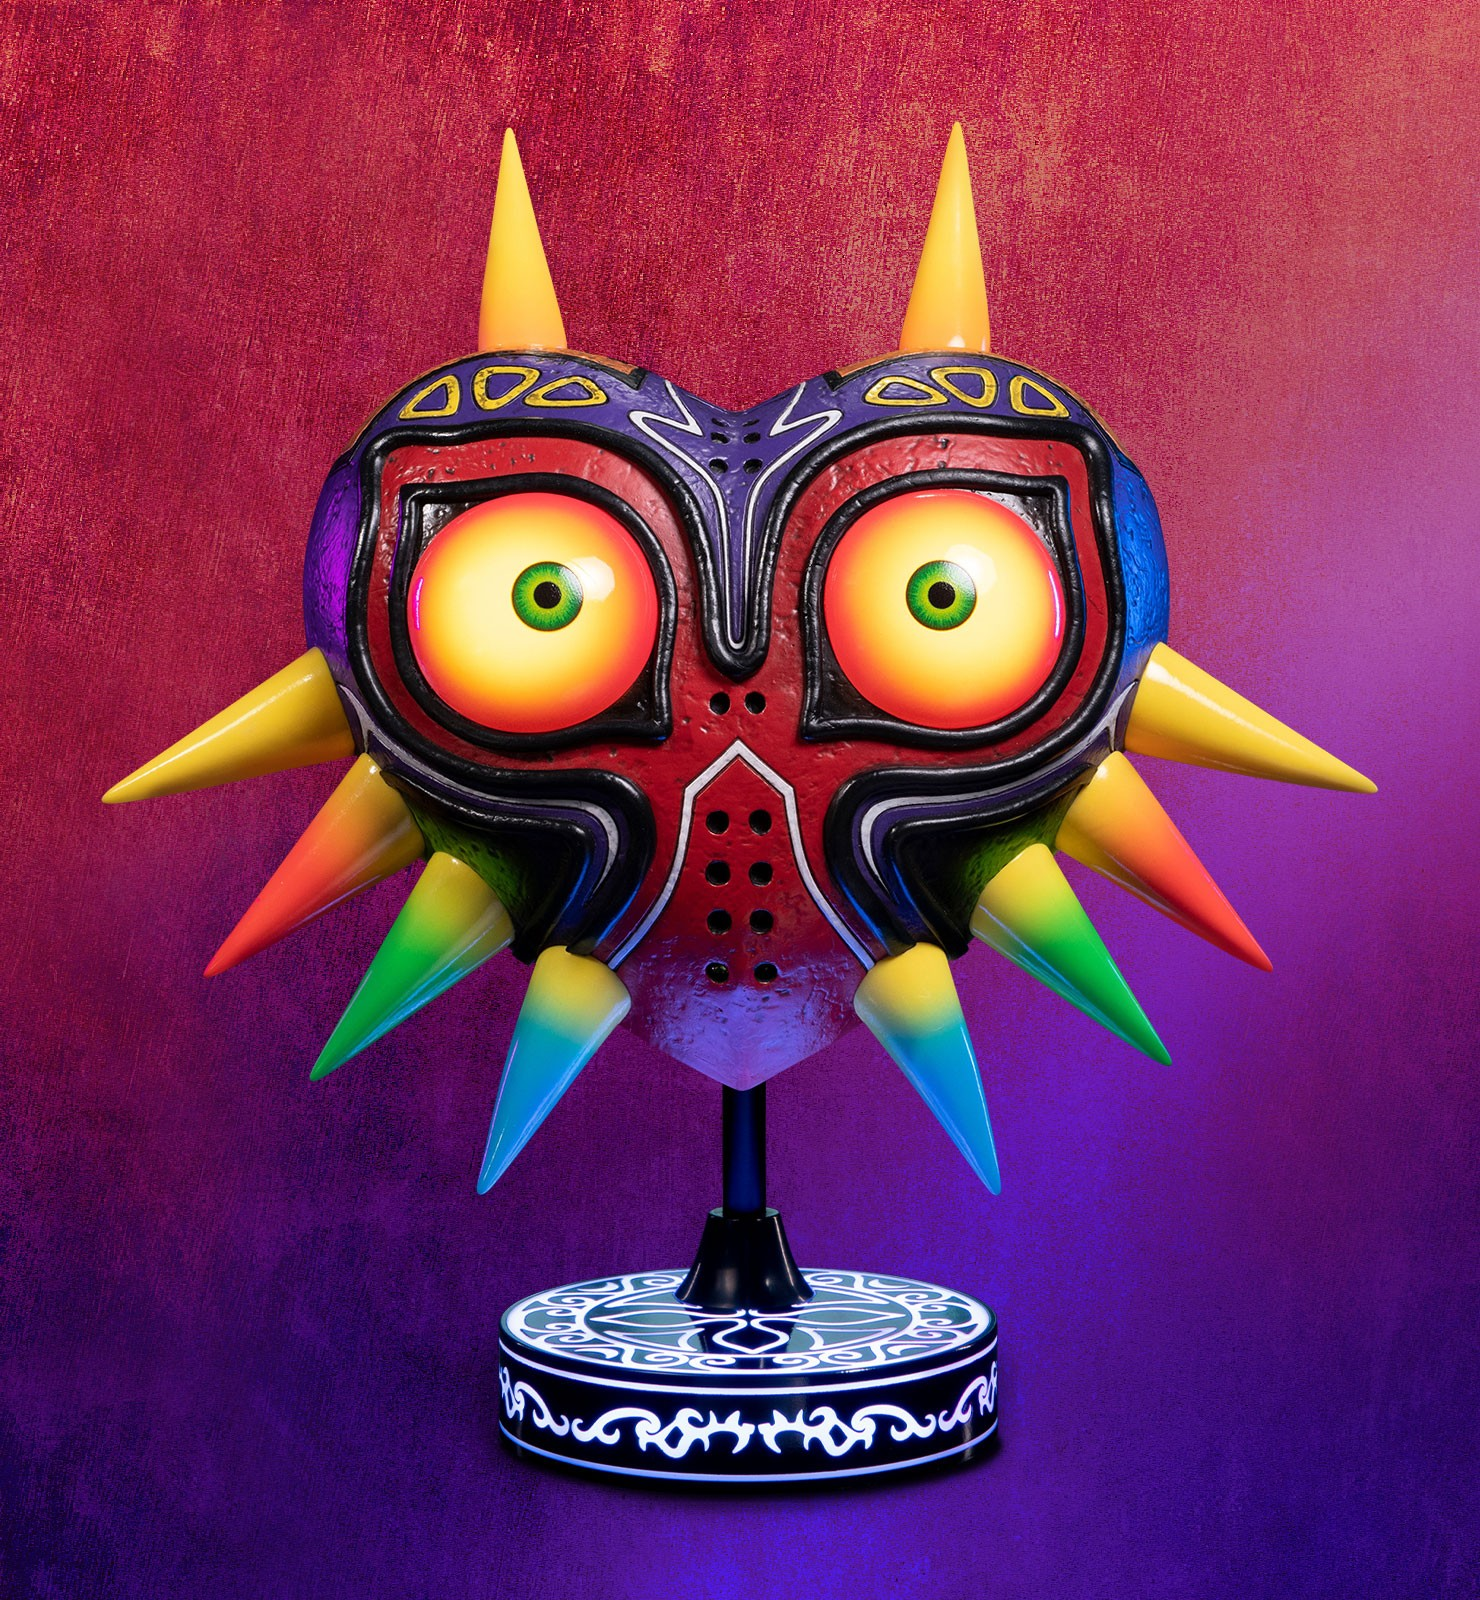 The Legend of Zelda Majora's Mask PVC Statue